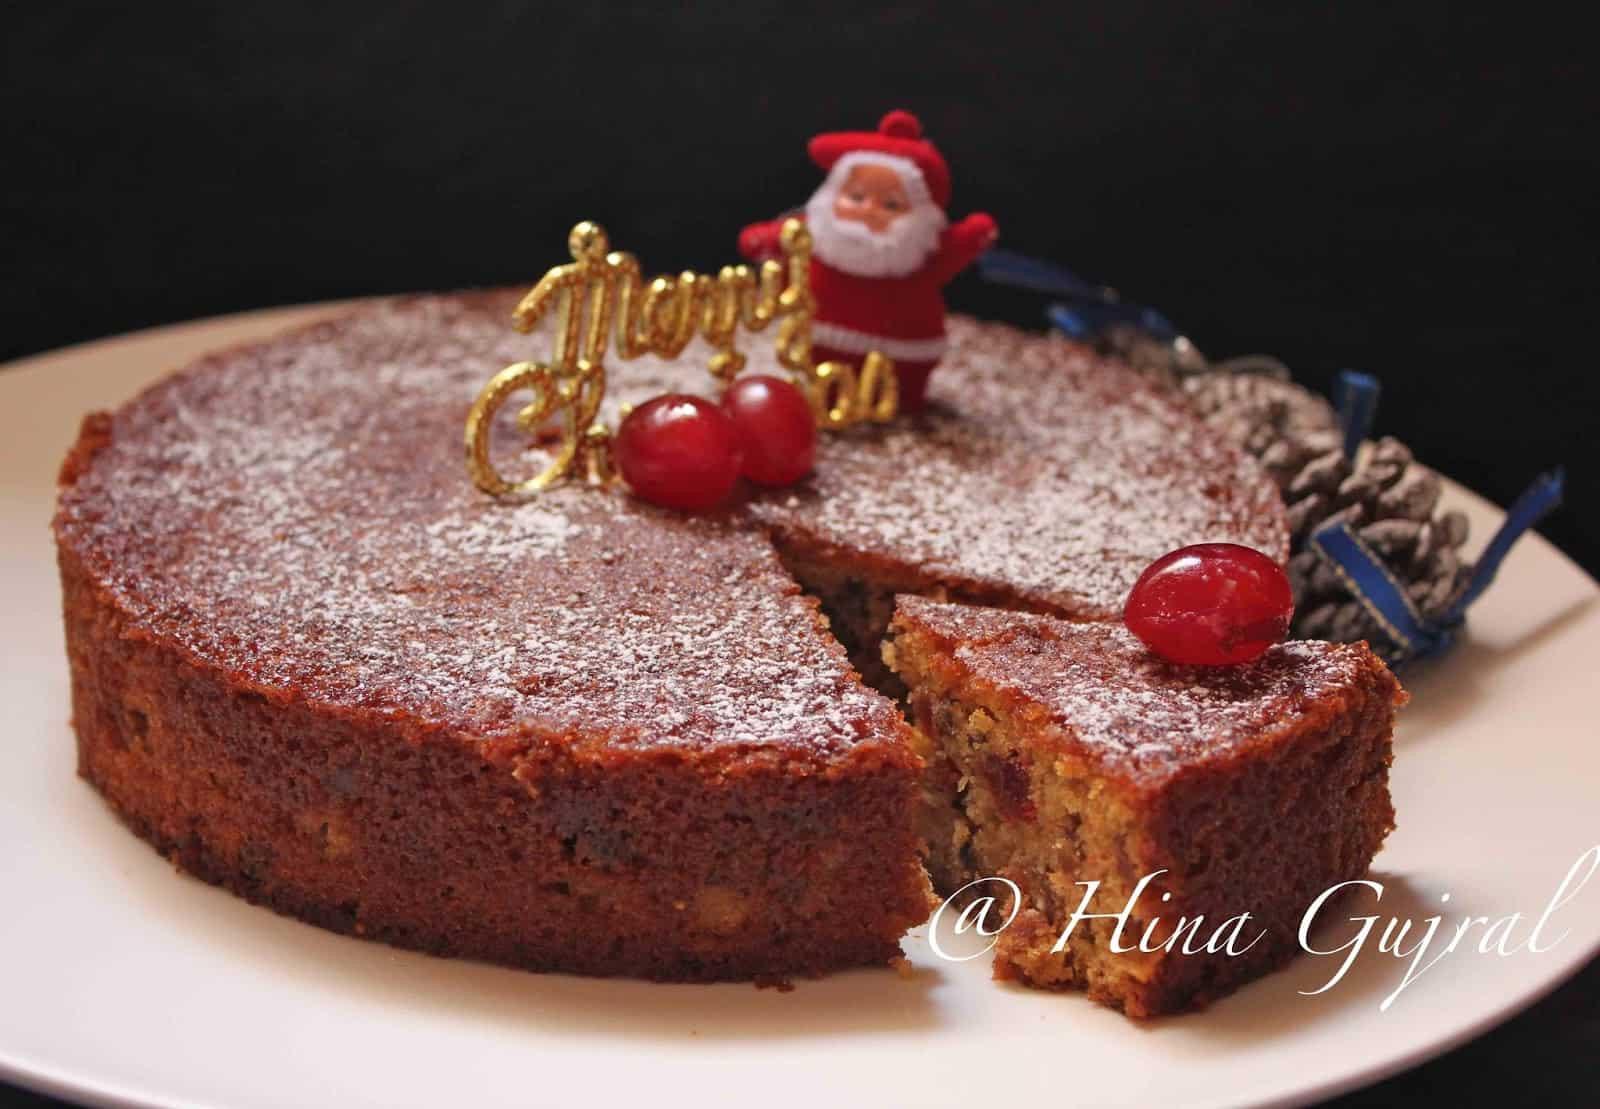 Christmas Fruit Cake Recipe With Rum  Traditional Christmas Fruit & Rum Cake Recipe Fun FOOD